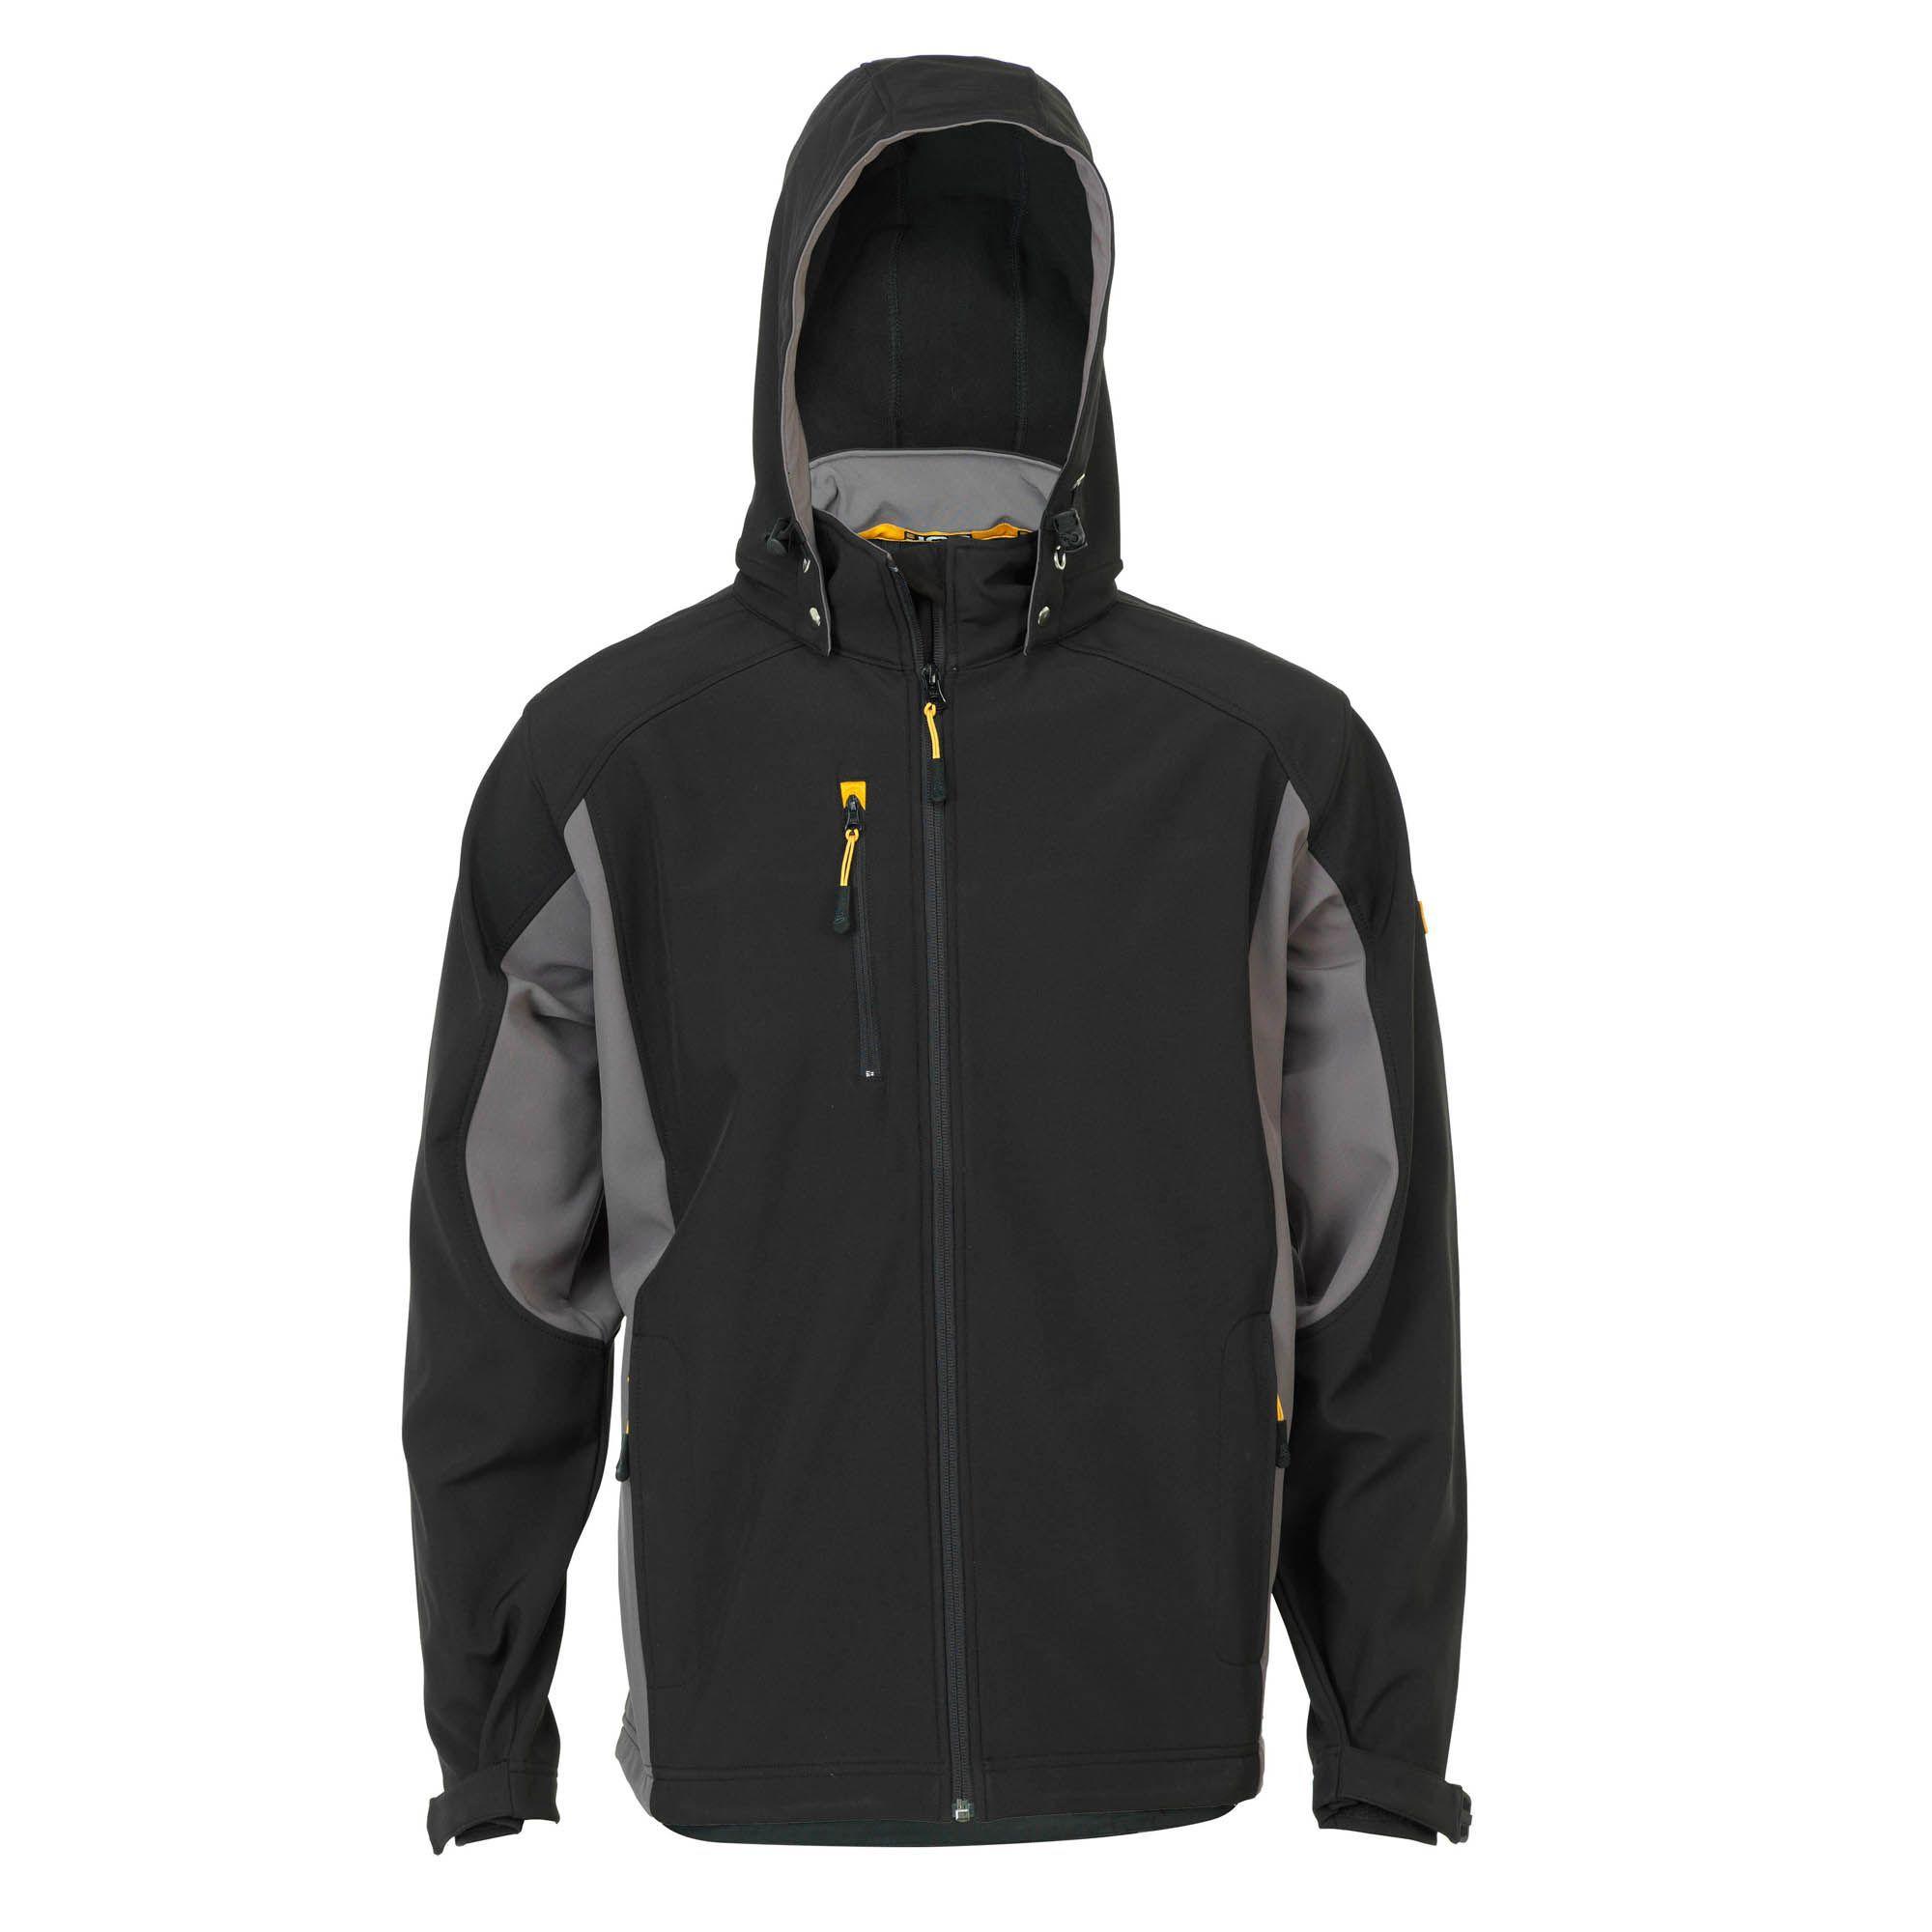 Jcb Black Stretton Jacket Small Departments Diy At B Amp Q